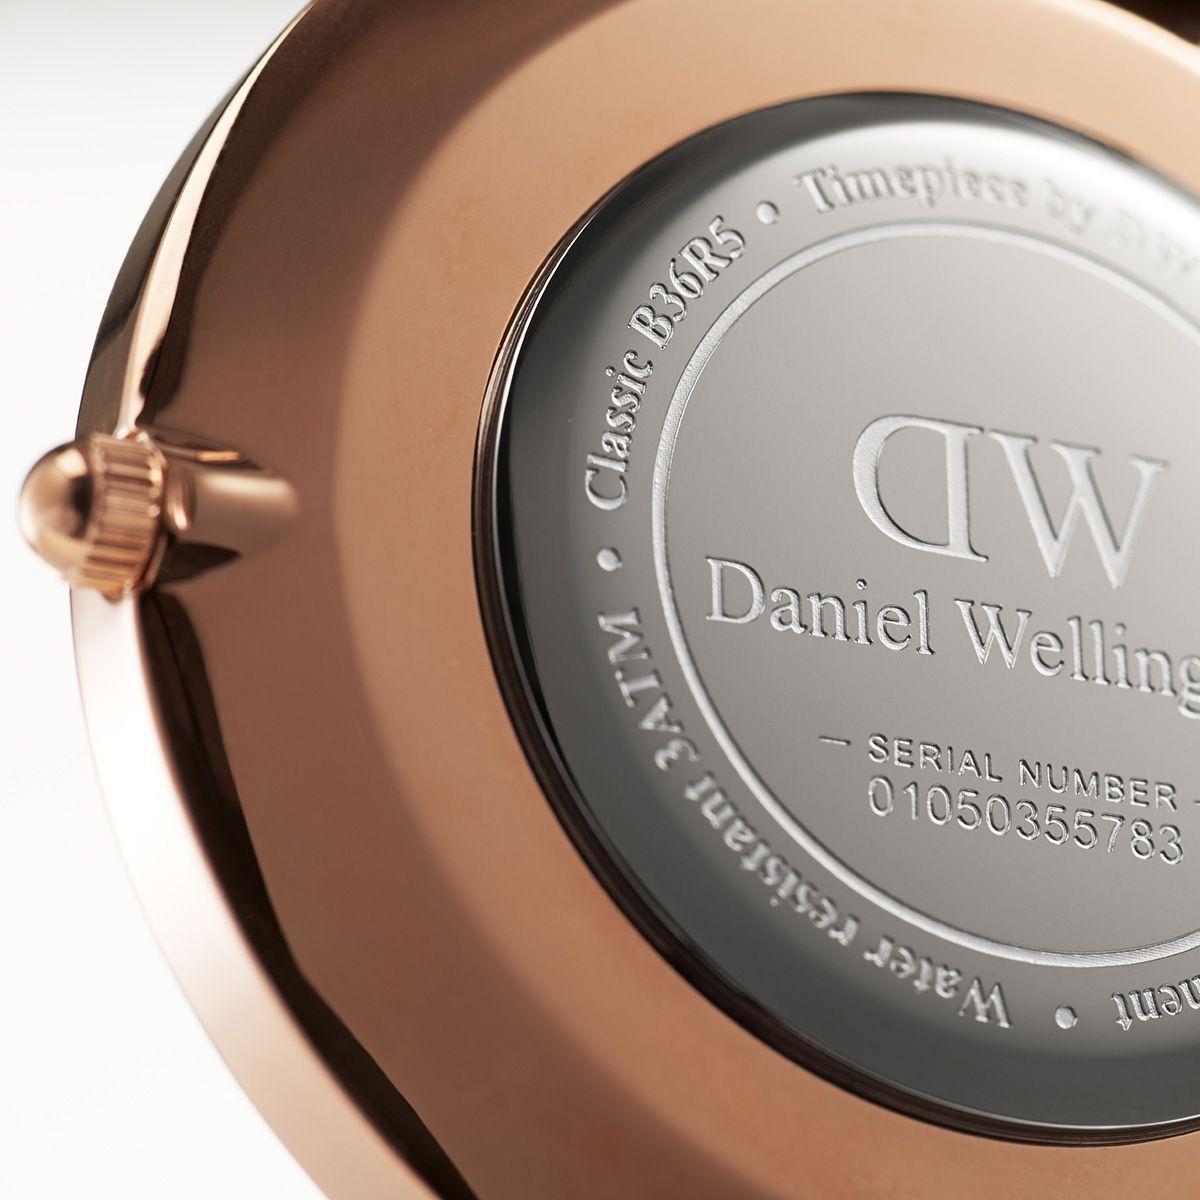 dw官网 dw手表官网 dw中国官网 dw官方旗舰店 DW DW官网  W Classic Bayswater RG 36mm